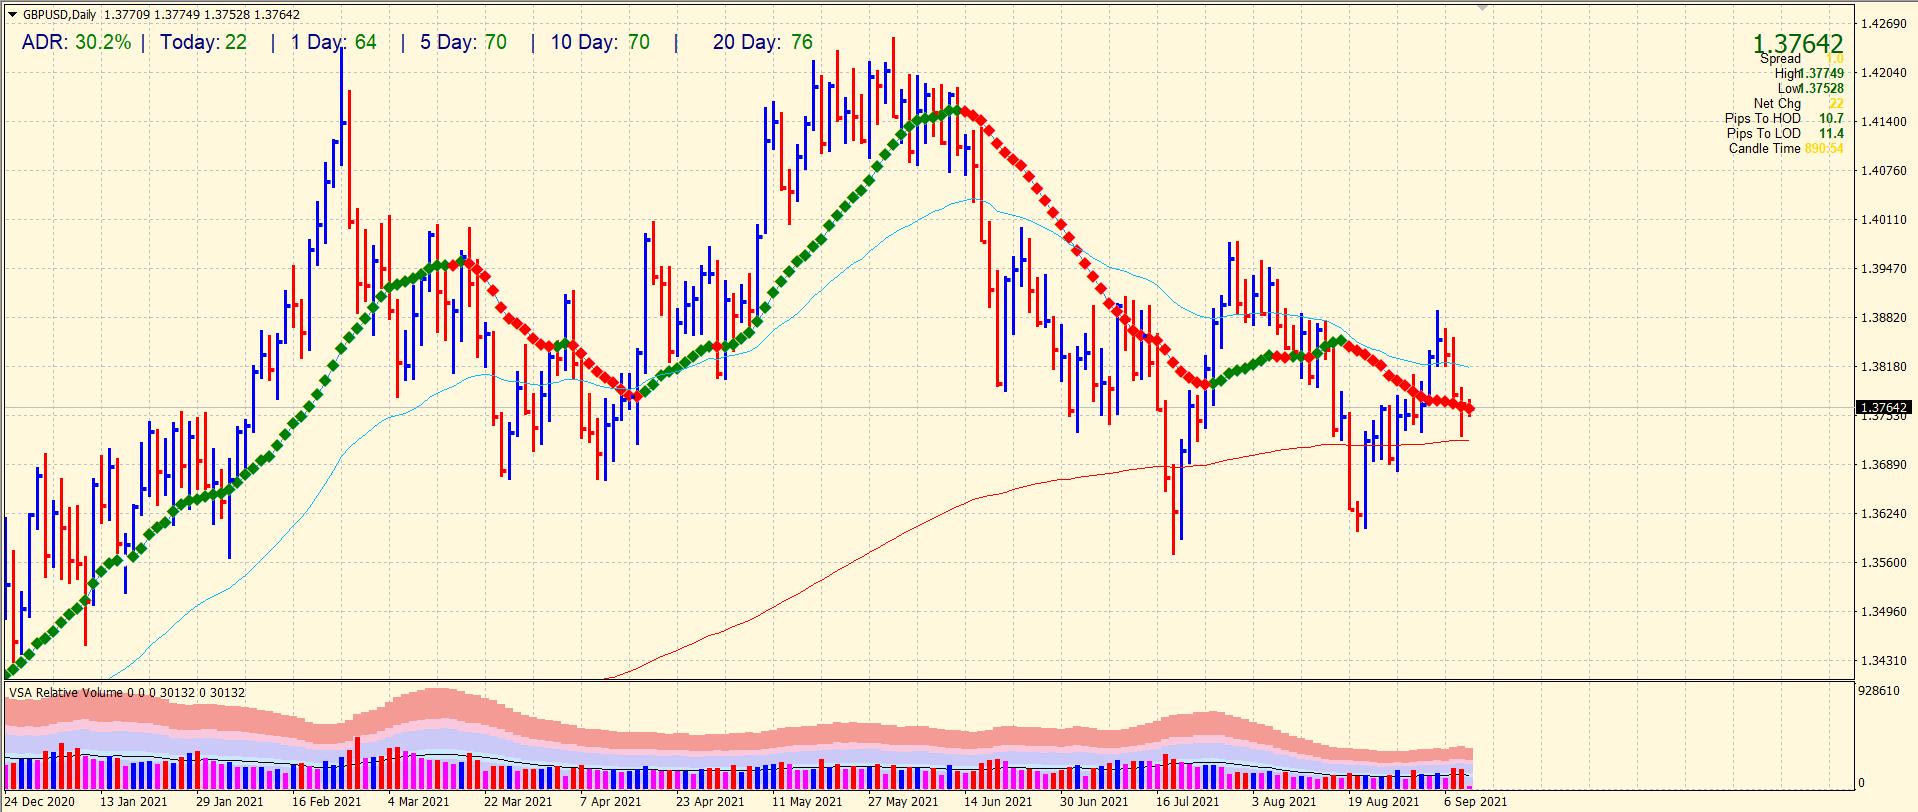 GBP/USD 4-hour price chart analysis